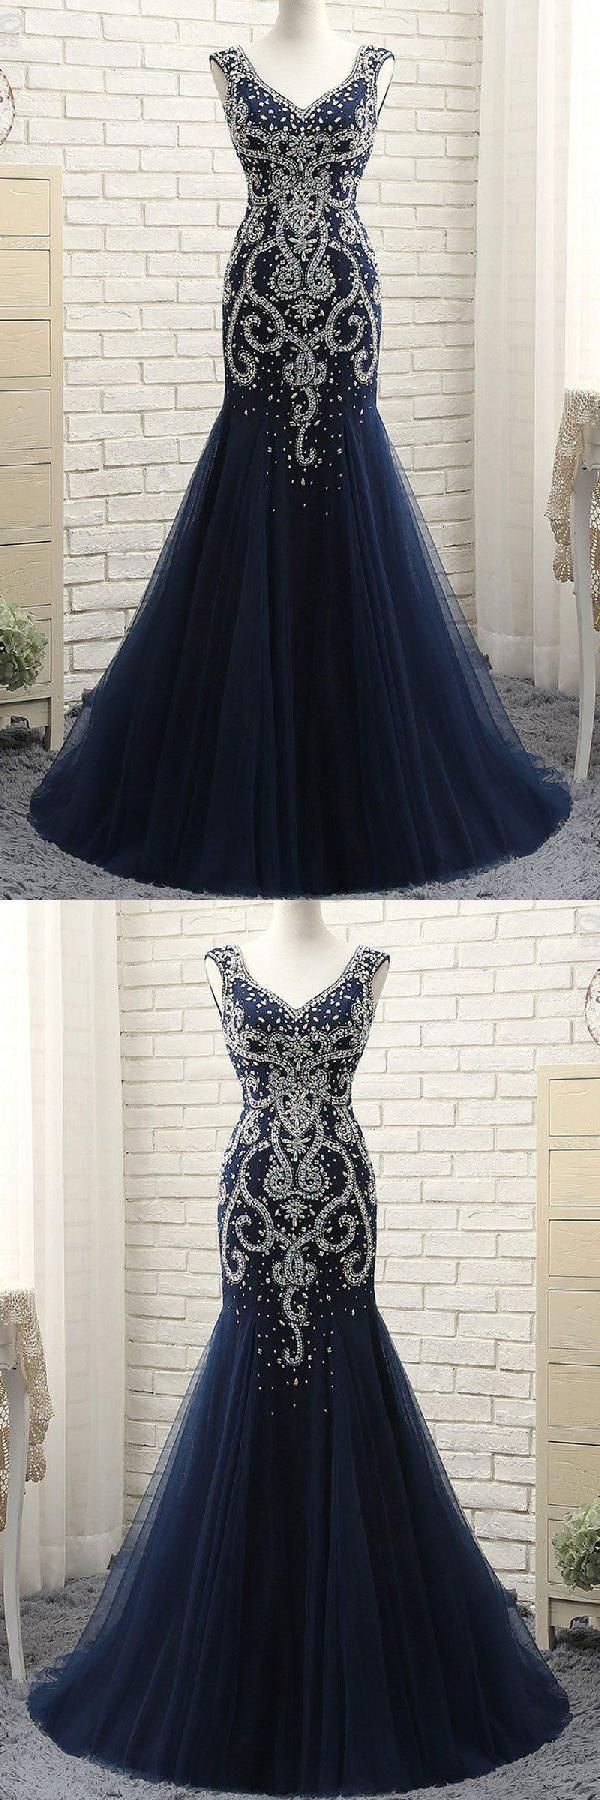 Prom dresses blue dark blue prom dresses prom dresses long